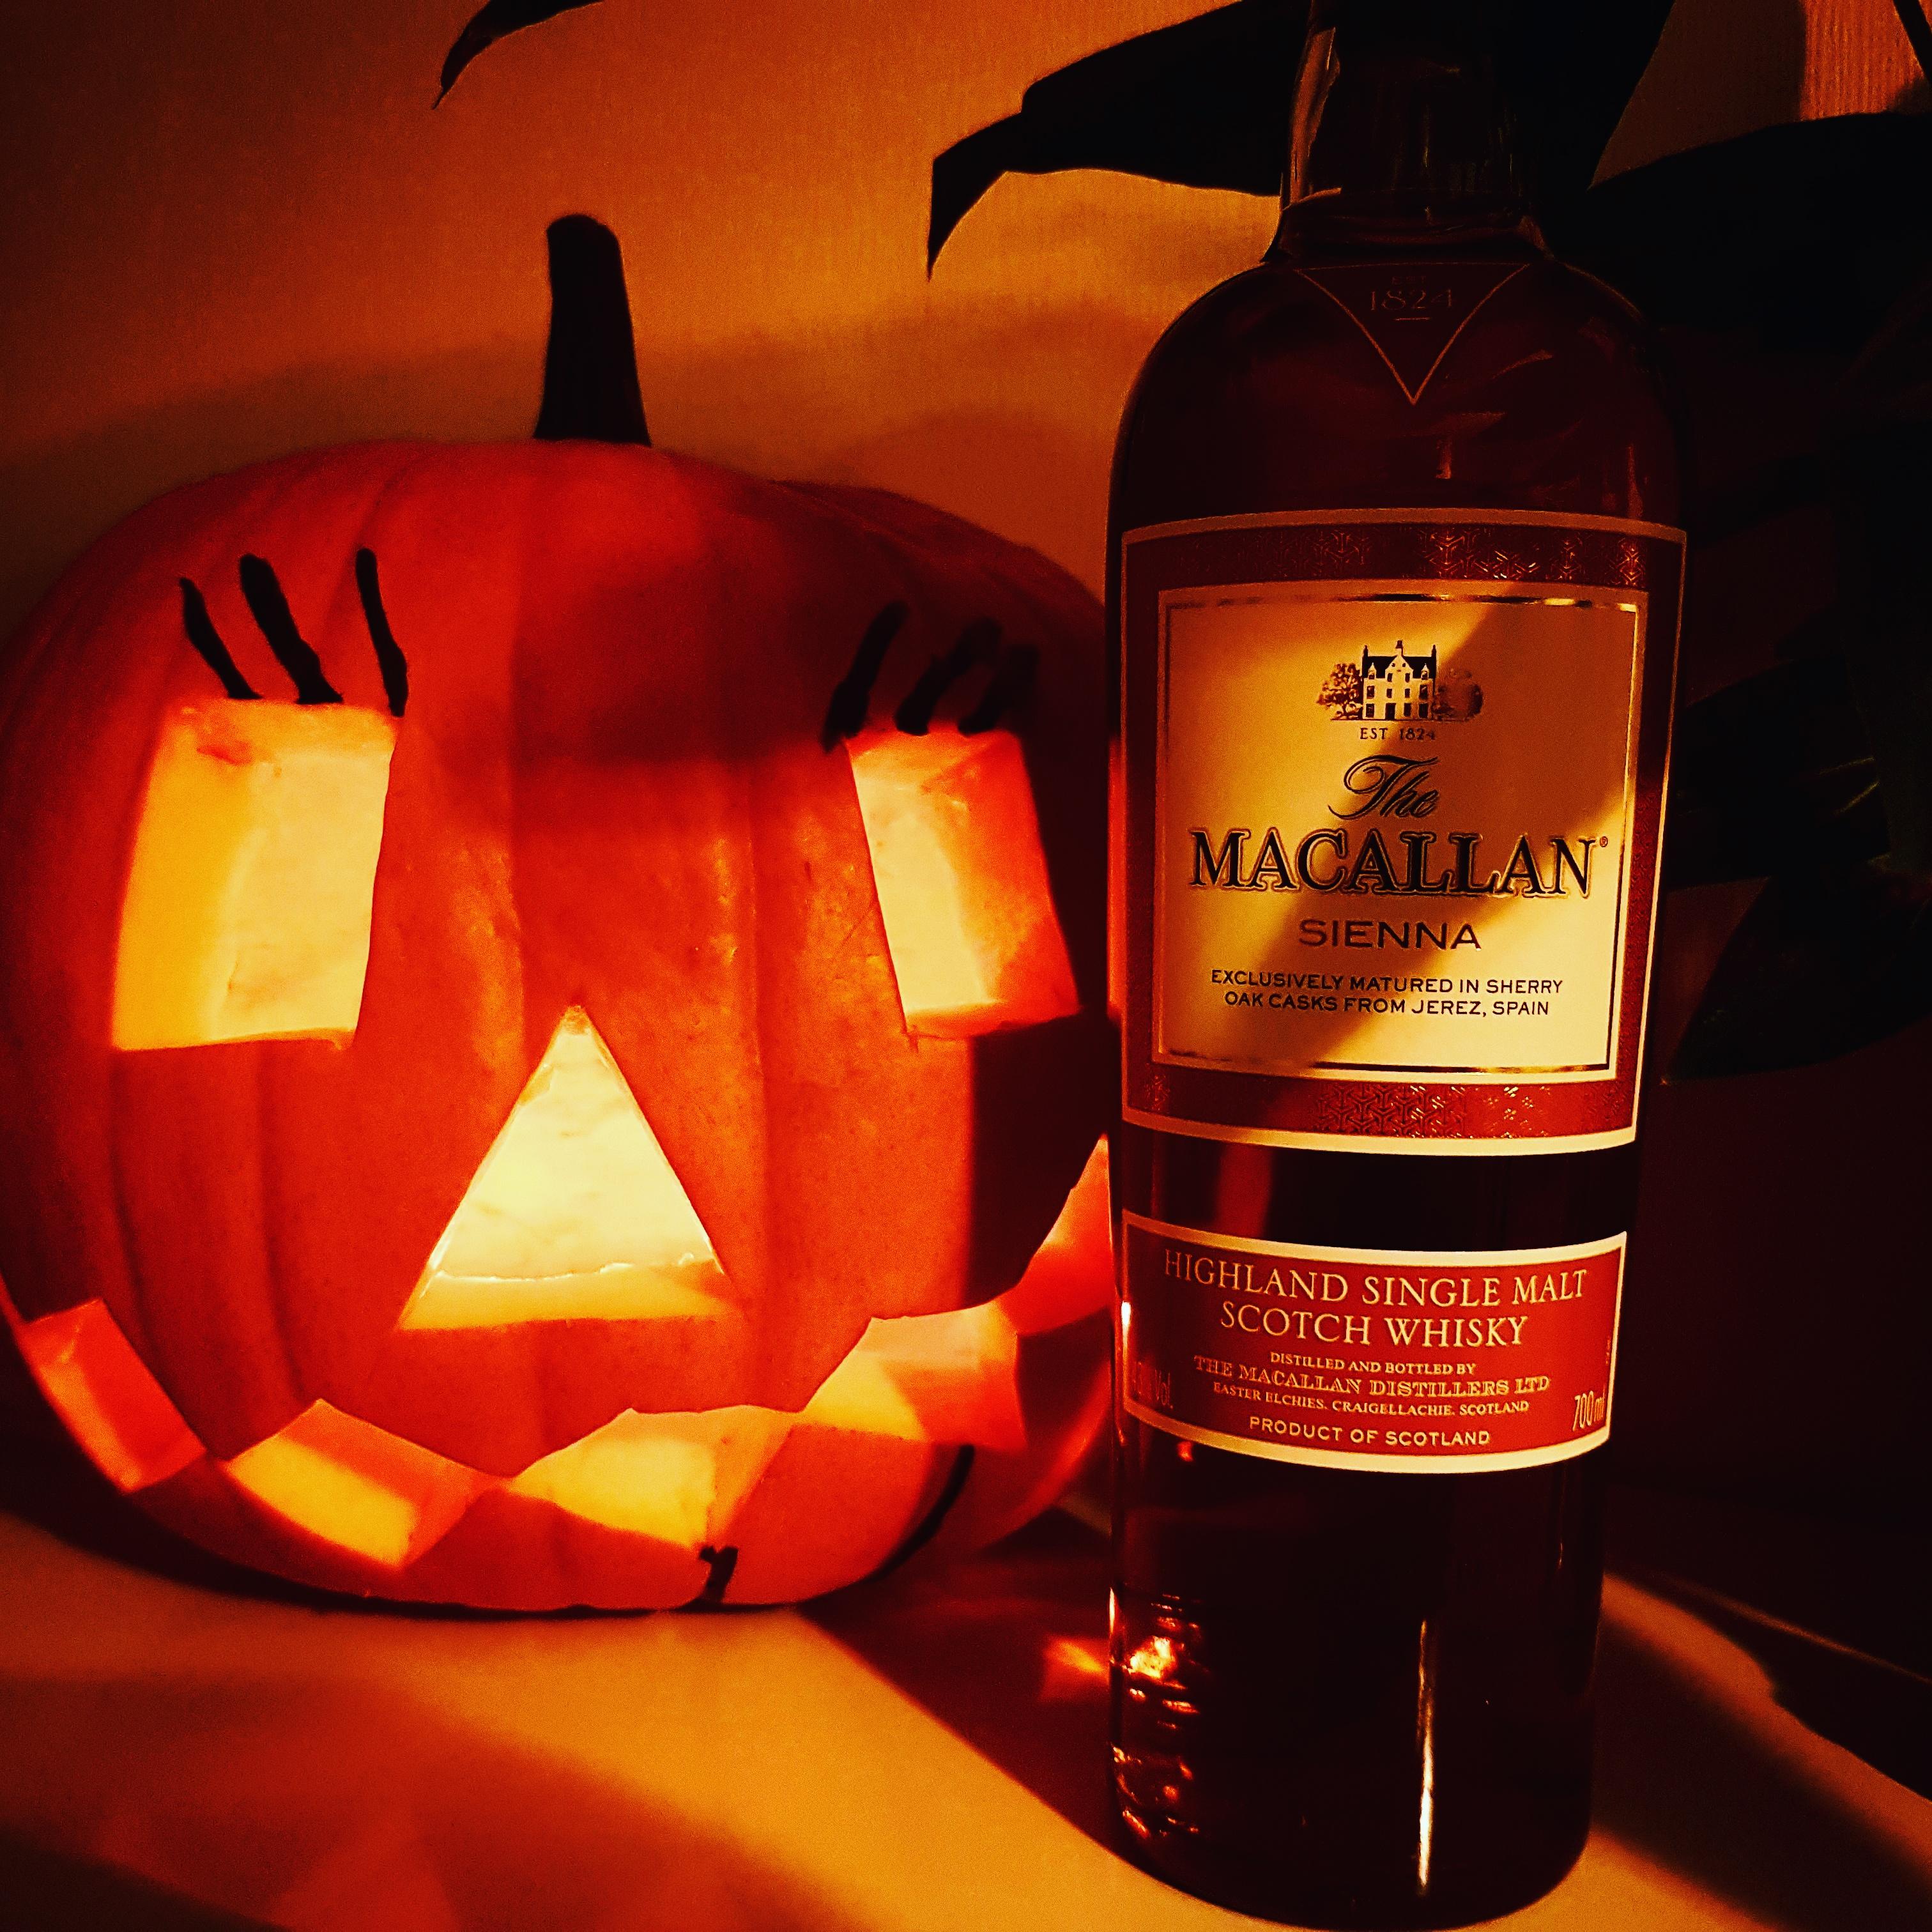 The Macallan Sienna Highland Single Malt Scotch Whisky